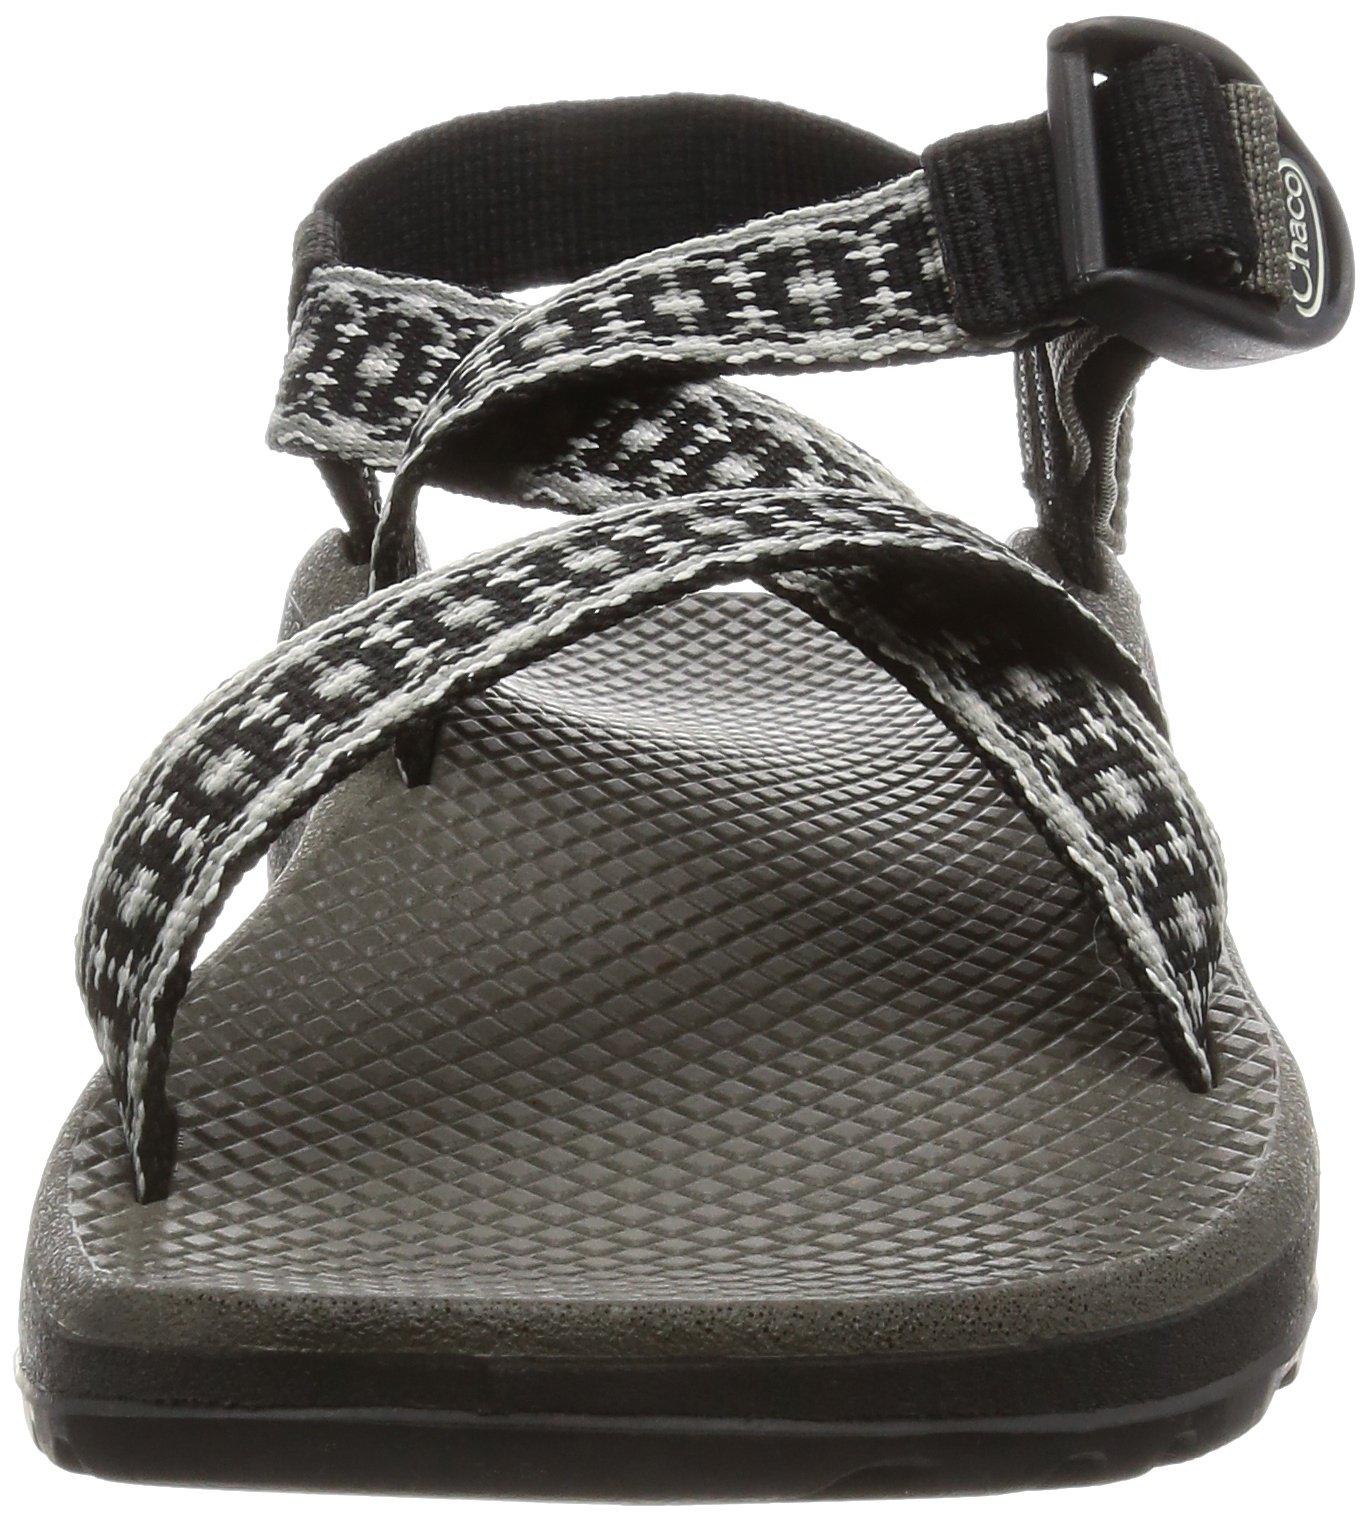 Chaco Women's Zcloud Sport Sandal, Venetian Black, 9 M US by Chaco (Image #4)